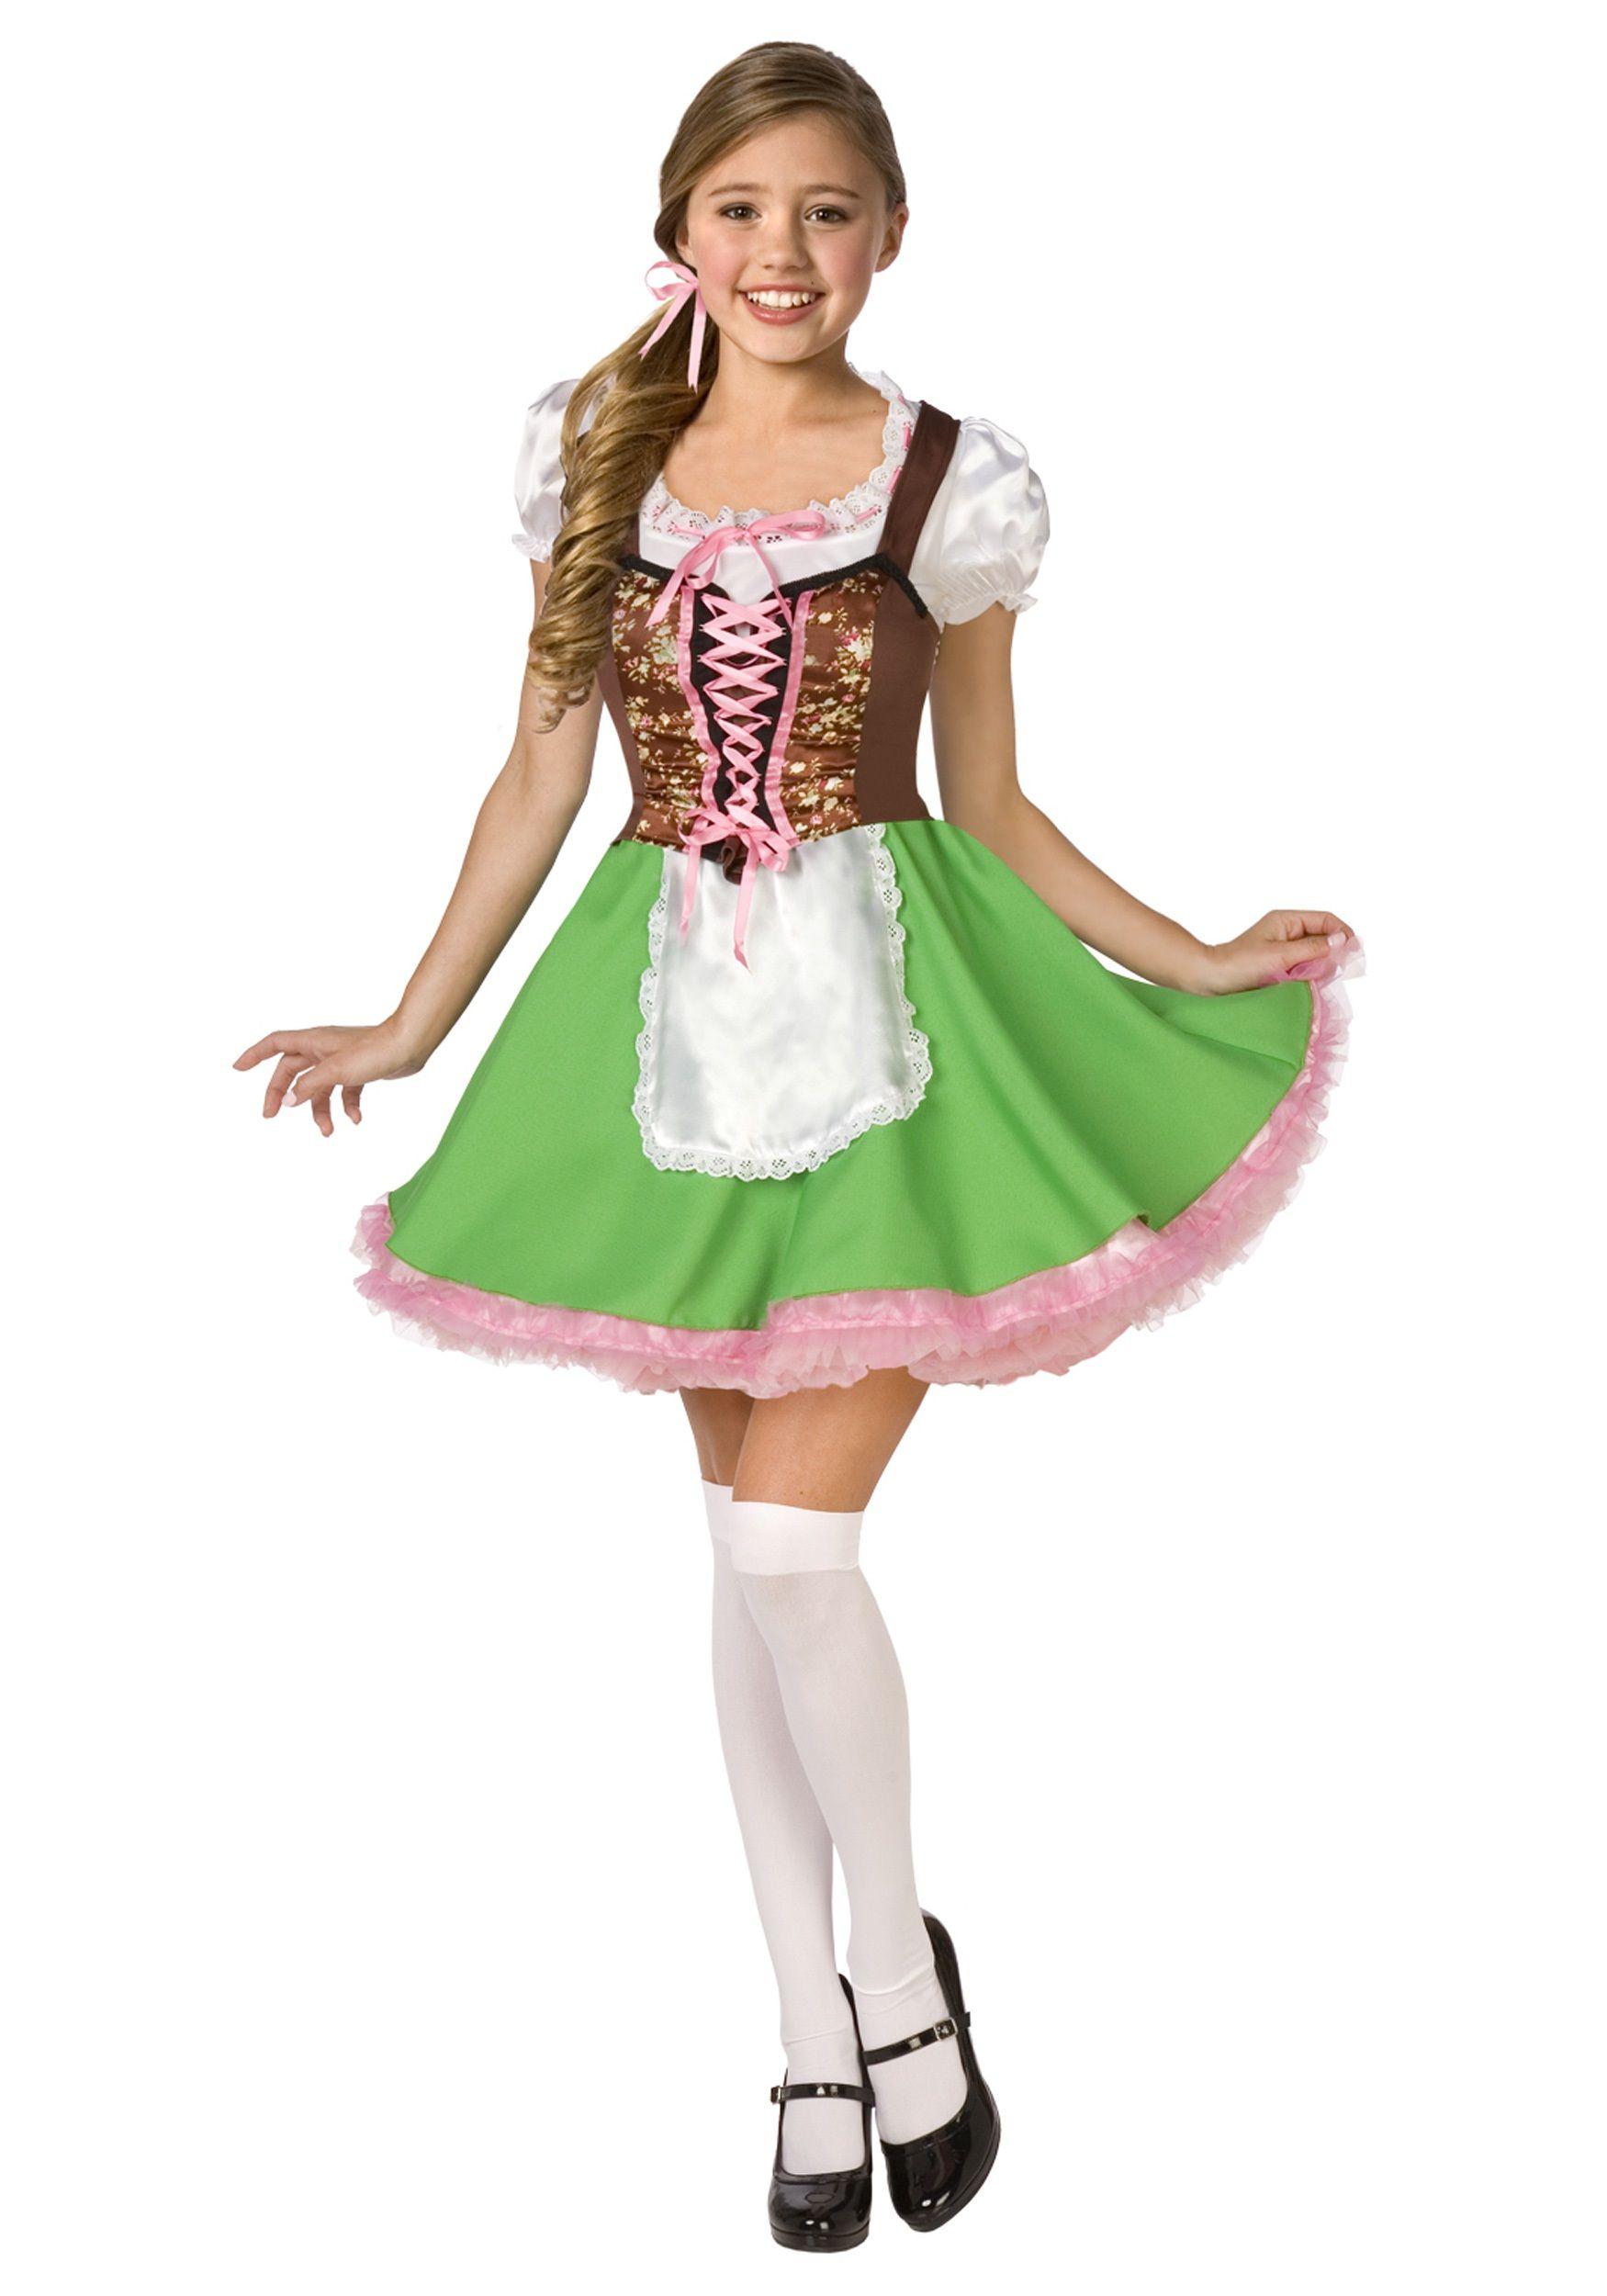 halloween costumes for girls gypsies | u003e Halloween Costume Ideas u003e International Costumes u003e German Costumes .  sc 1 st  Pinterest & halloween costumes for girls gypsies | u003e Halloween Costume Ideas ...